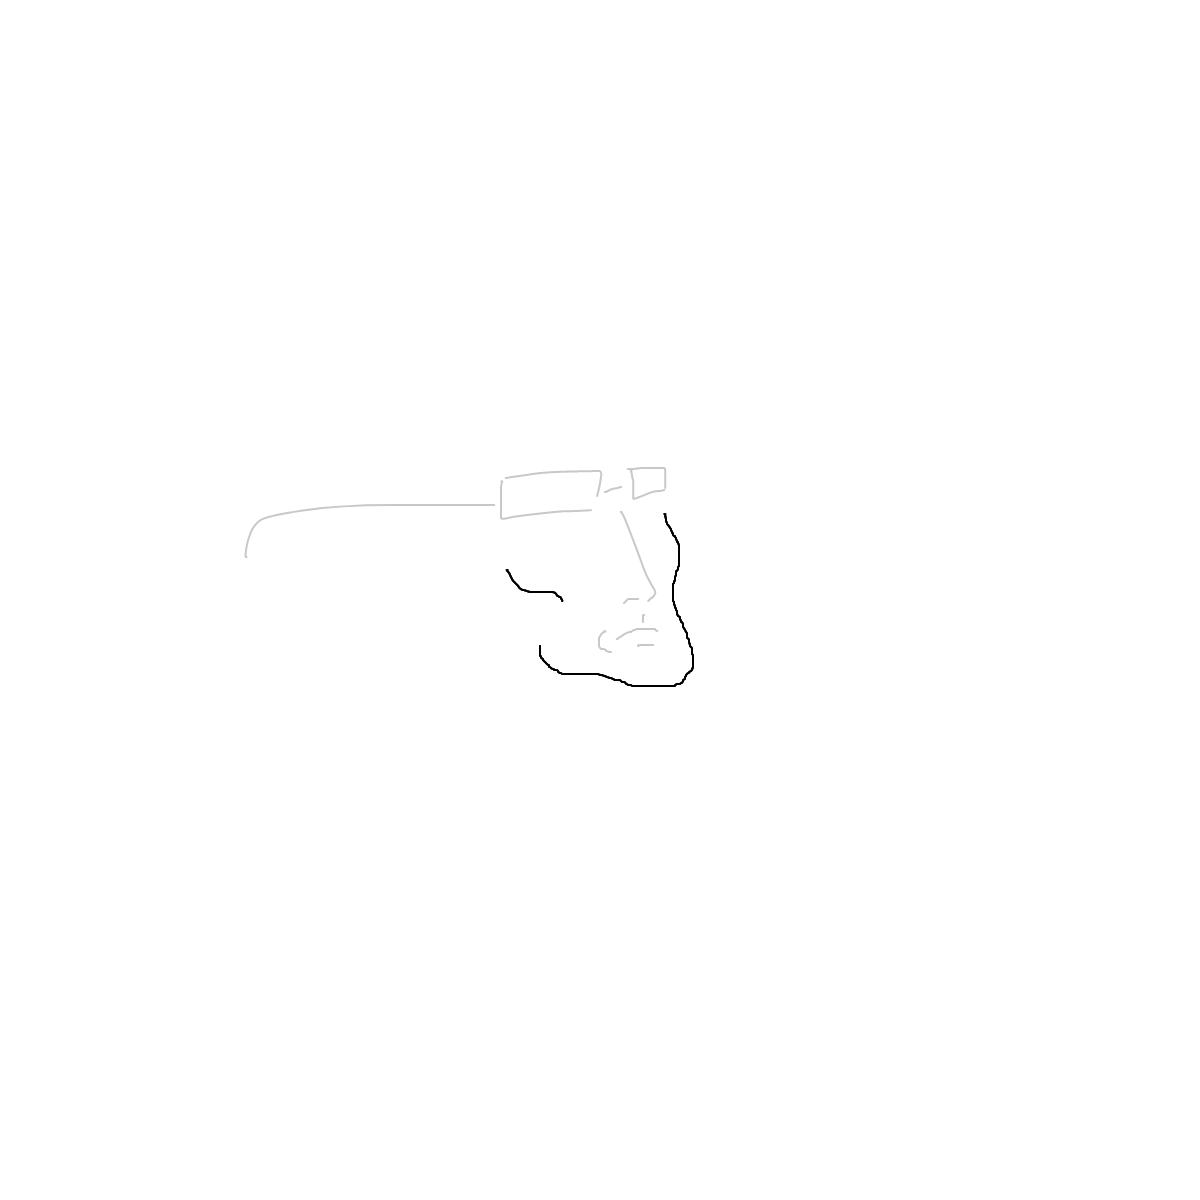 BAAAM drawing#23619 lat:45.7998542785644500lng: 15.9283638000488280